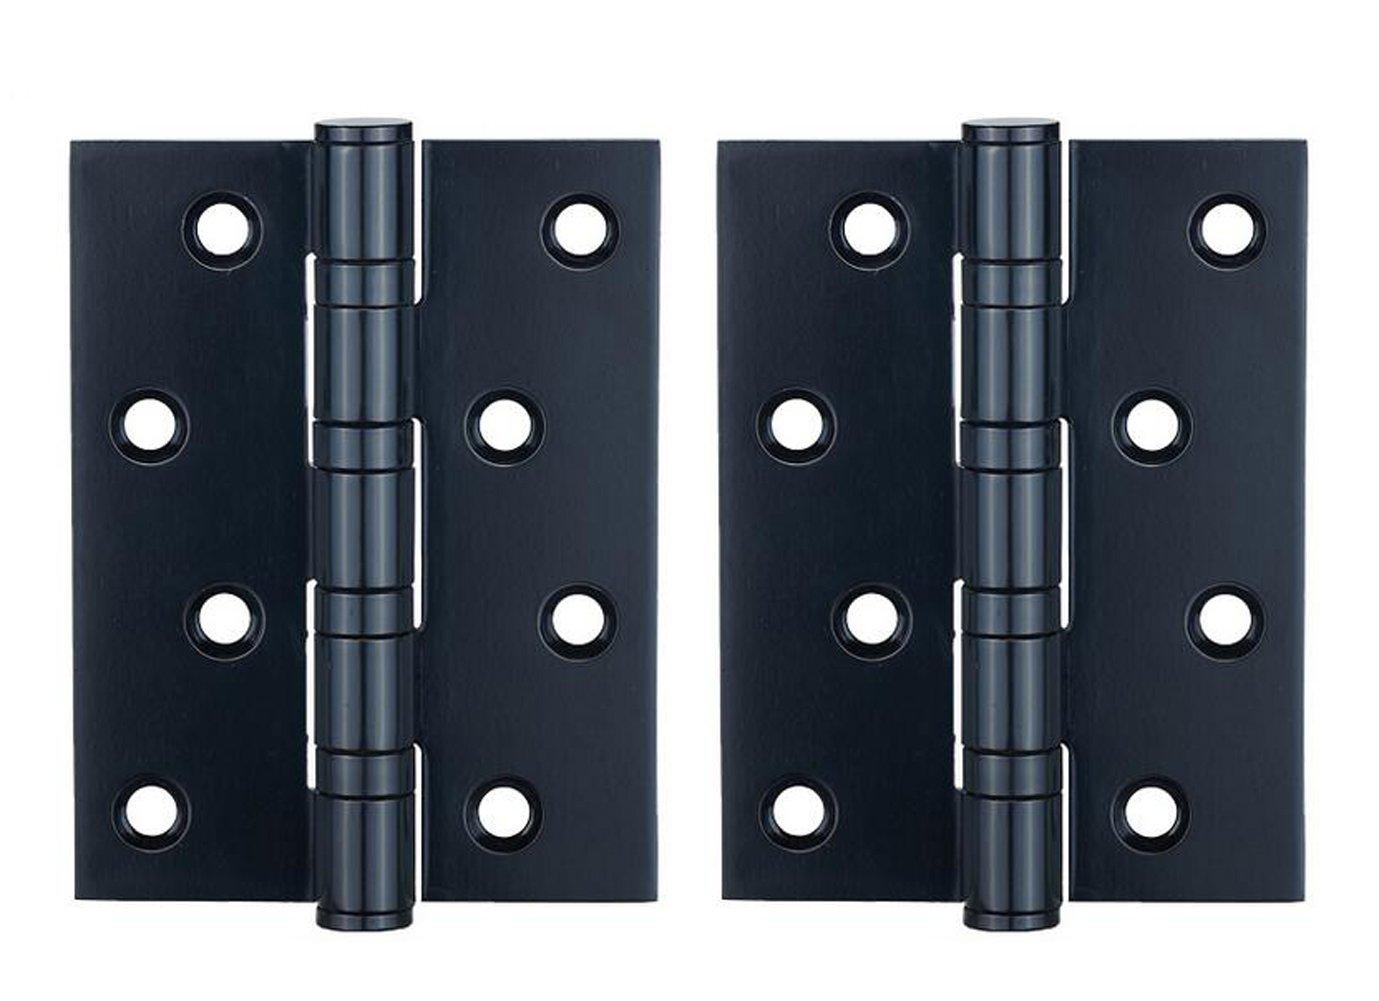 2Pcs 4inch Door Hinges Ball Bearing Hinge Stainless Steel Folding Butt Hinges Tone Home Furniture Hardware (Black)